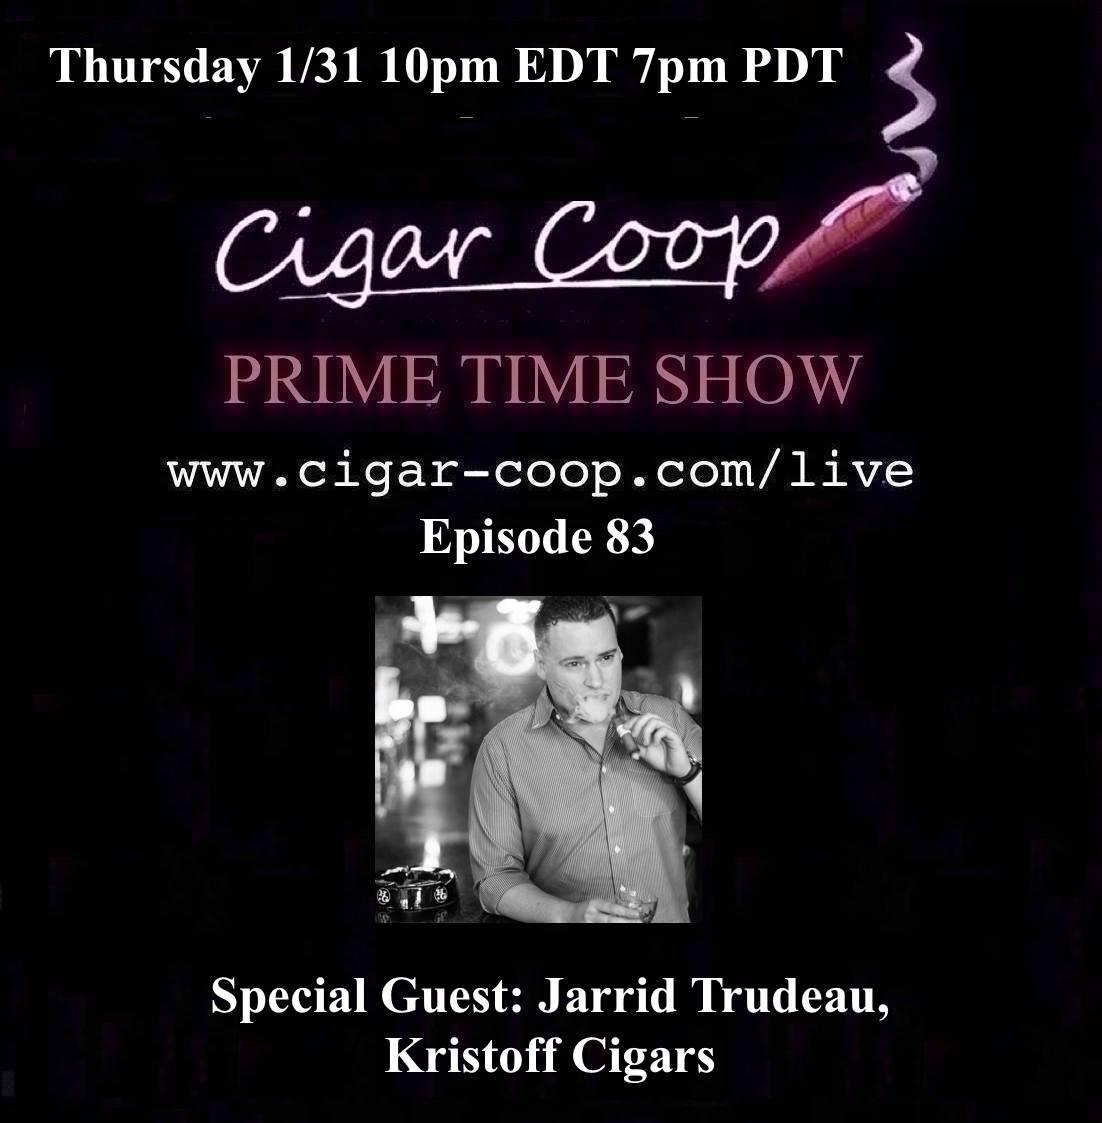 Announcement: Prime Time Episode 83: Jarrid Trudeau, Kristoff Cigars